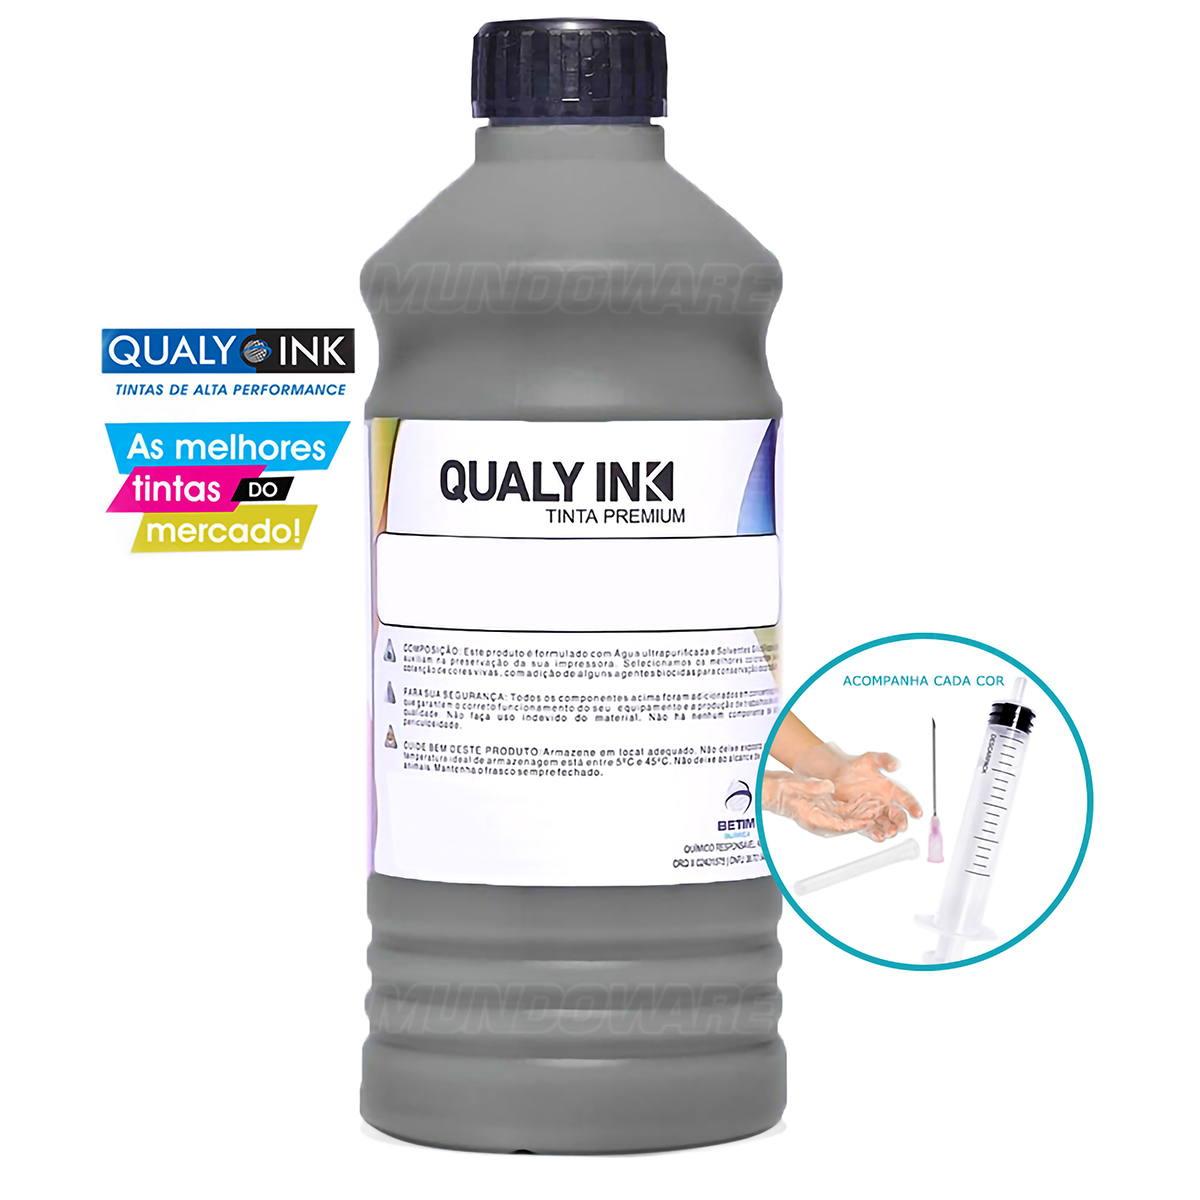 Compatível: Tinta Corante Qualy-Ink BC3E-1509 Série 504 / 544 para Epson L3110 L3111 L3150 L6160 Preto 1L